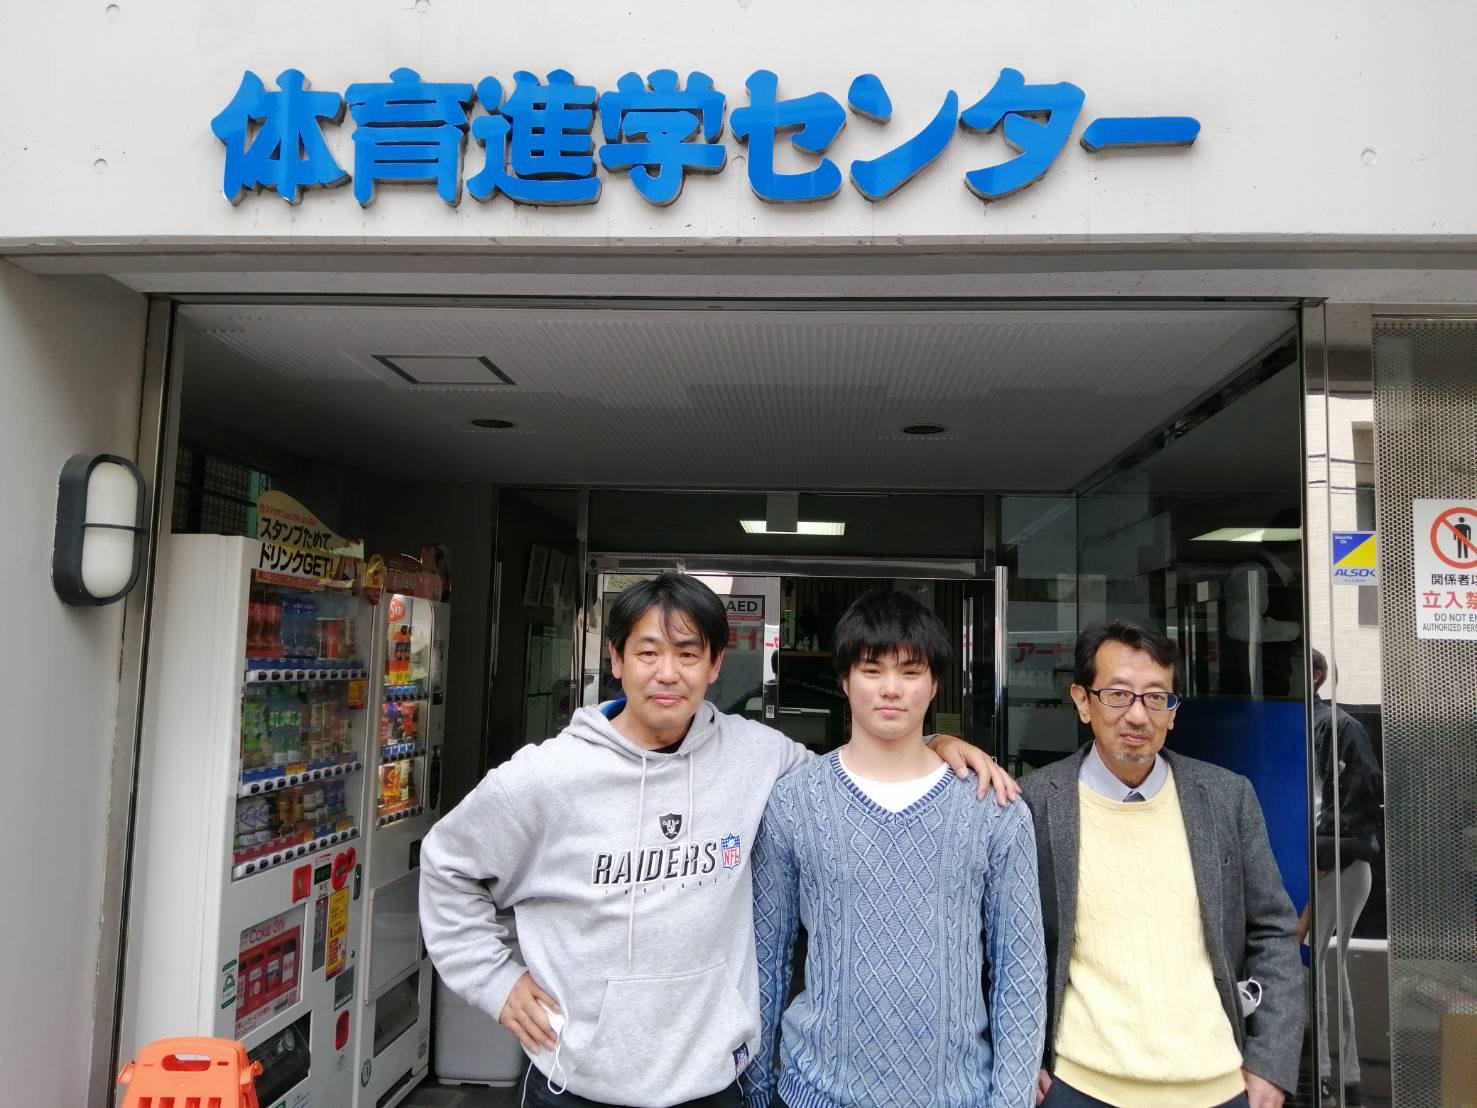 http://www.e-taishin.com/diary/img/1_2_20210315_mizu.jpg